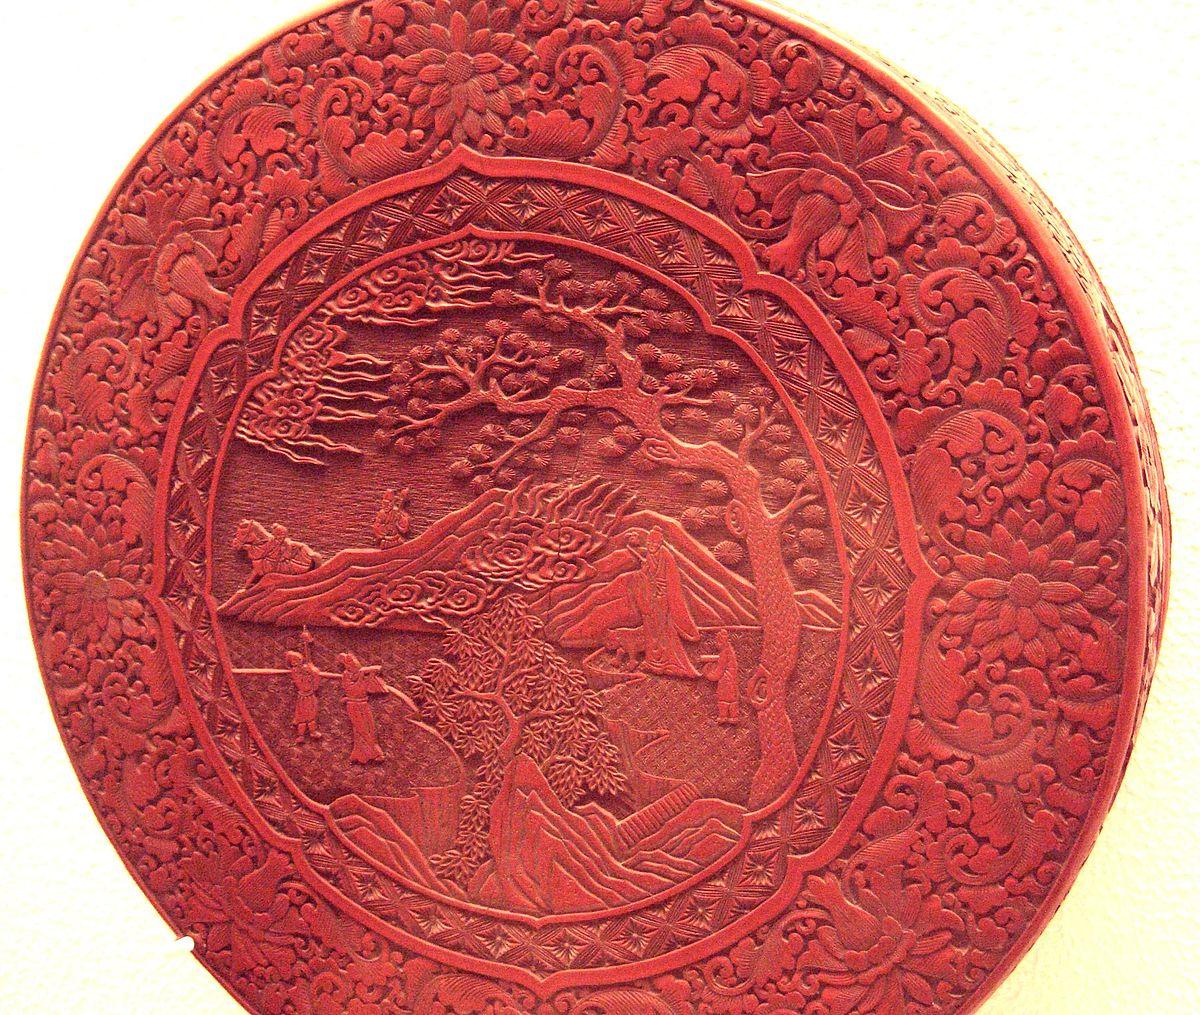 chinesische lackkunst – wikipedia